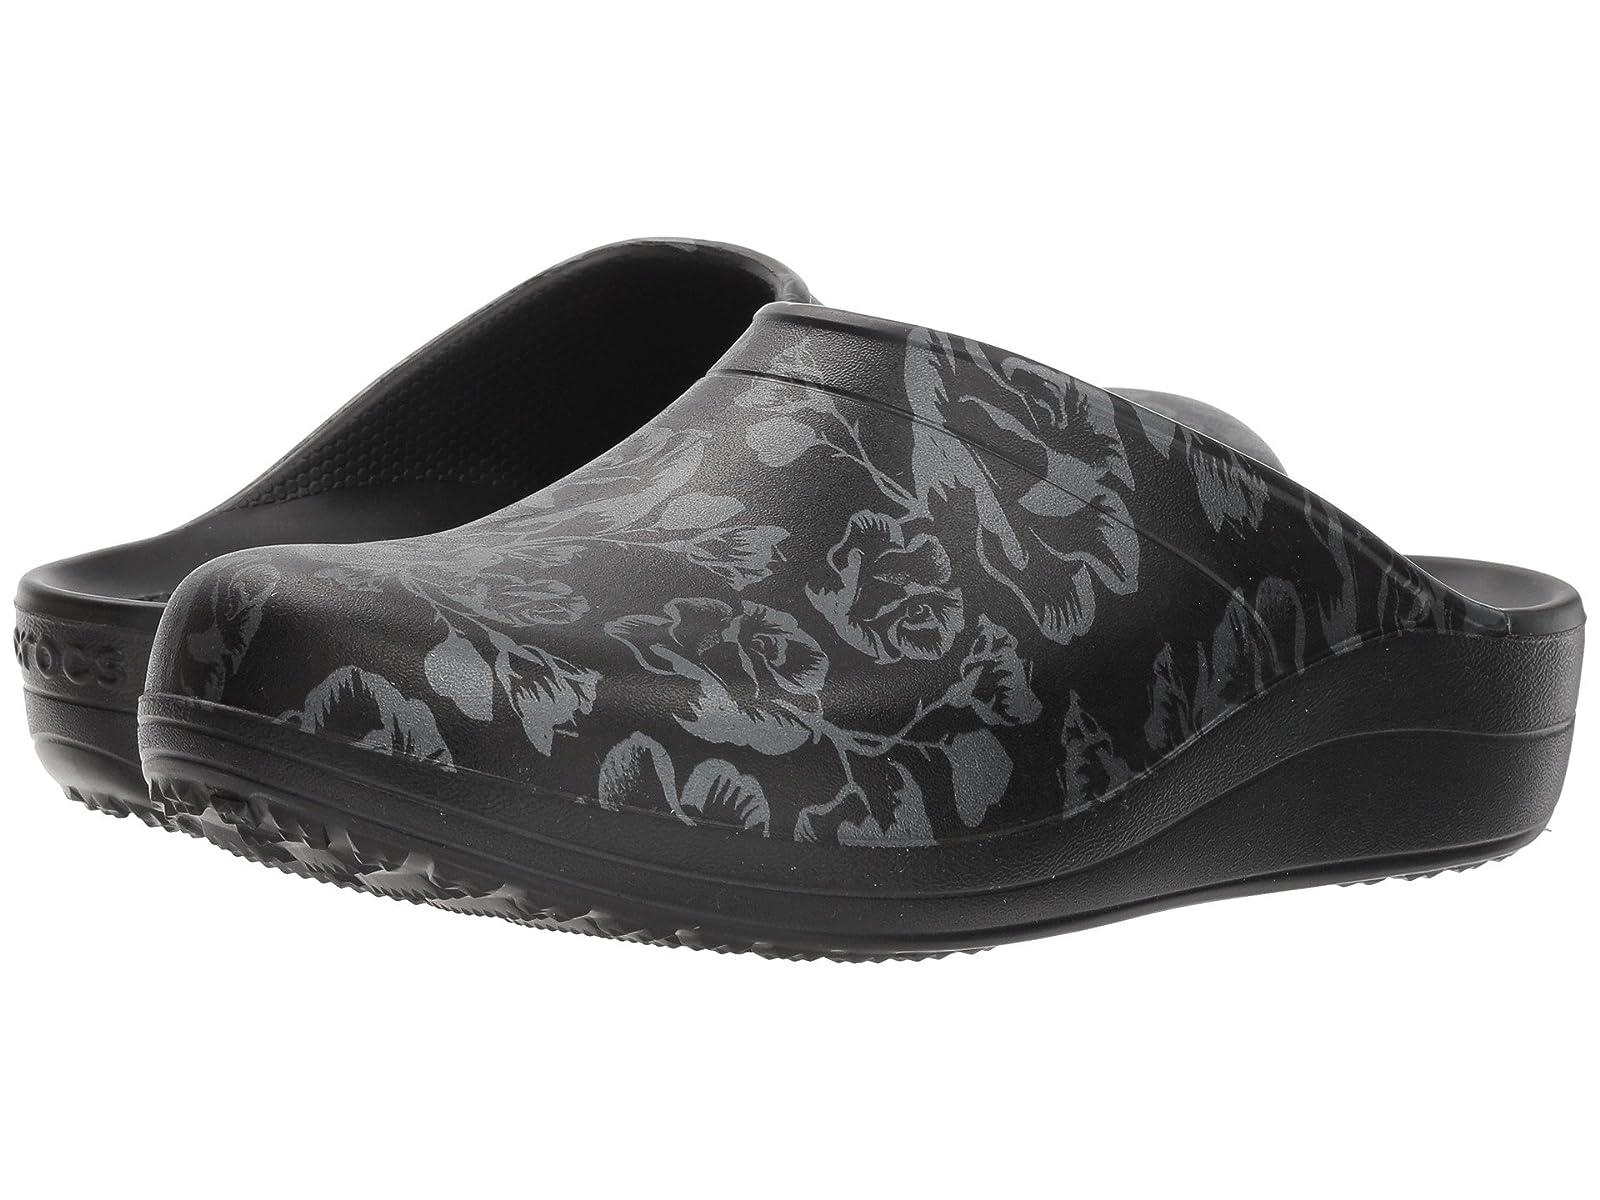 Crocs Sloane Graphic ClogEconomical and quality shoes